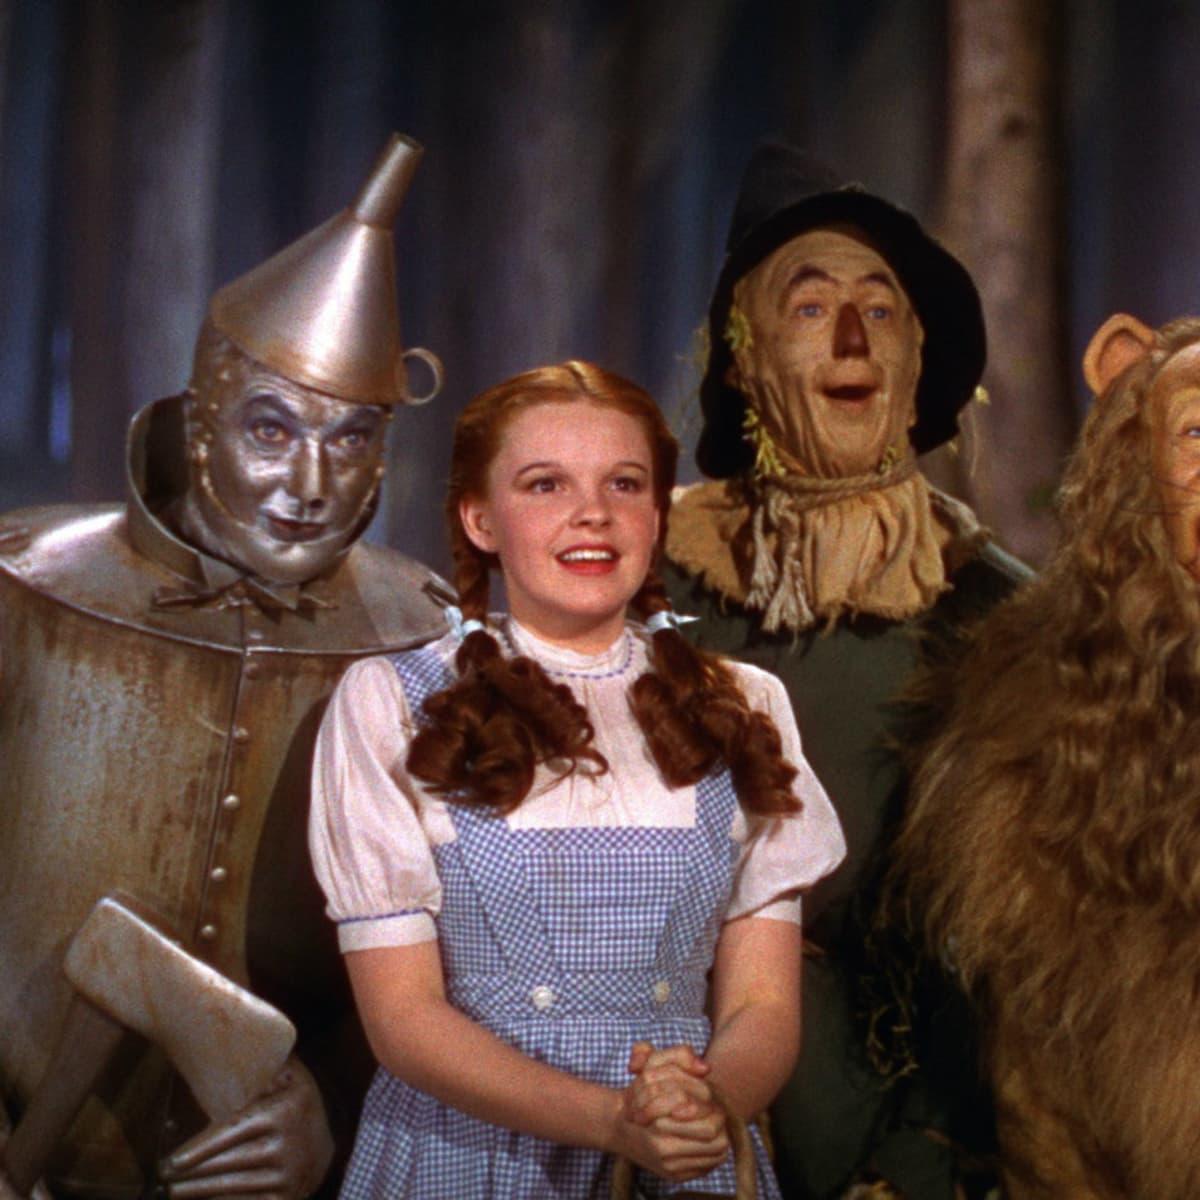 cast of Wizard of Oz film